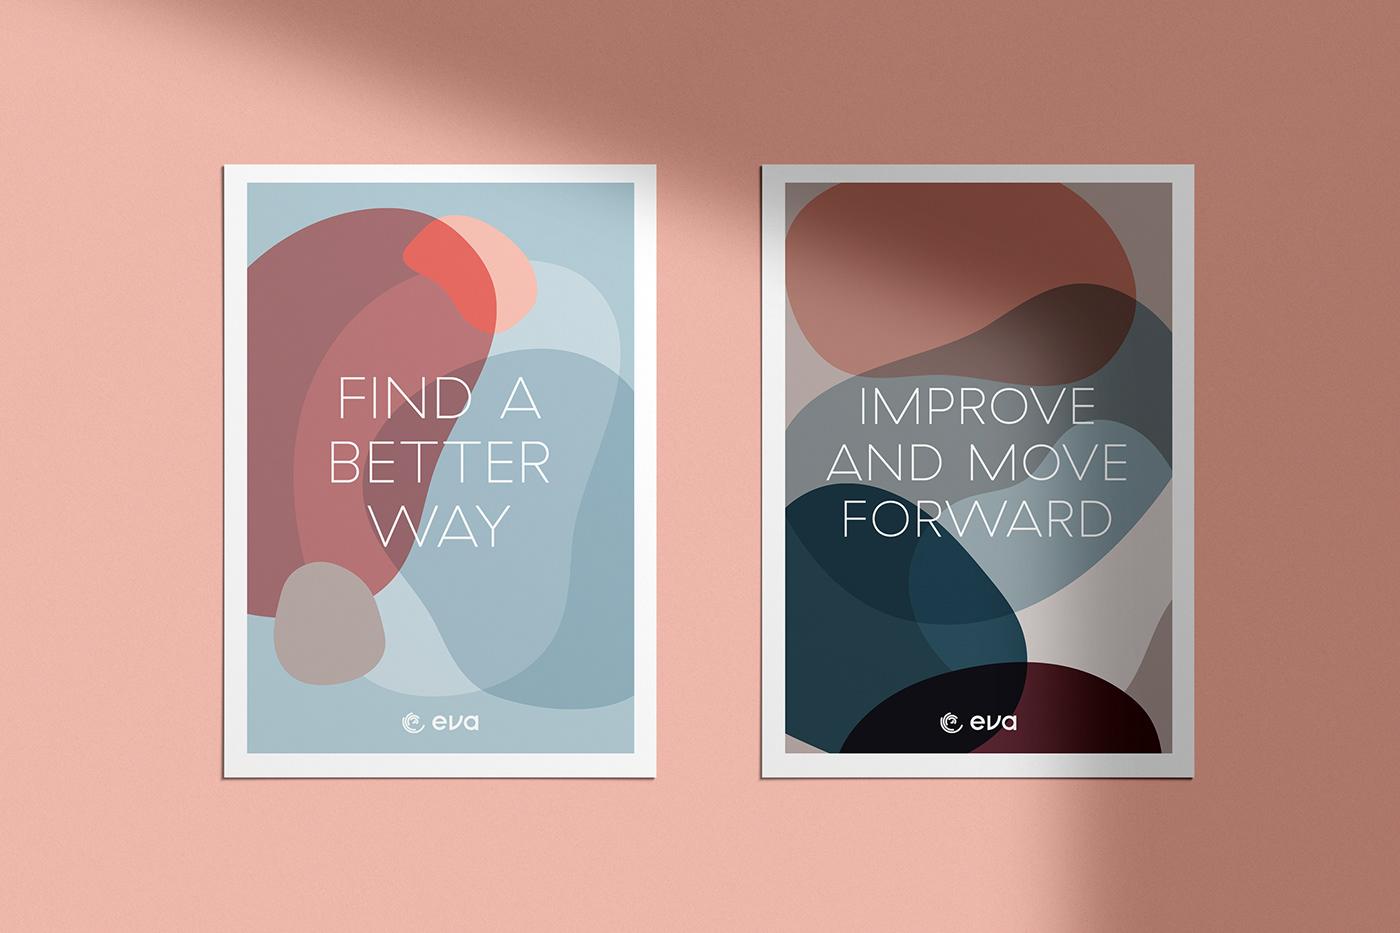 breast cancer awareness women empowerment mexico eva the bra Clinics environment graphics Packaging Logo Design Lobster Phone health and wellness